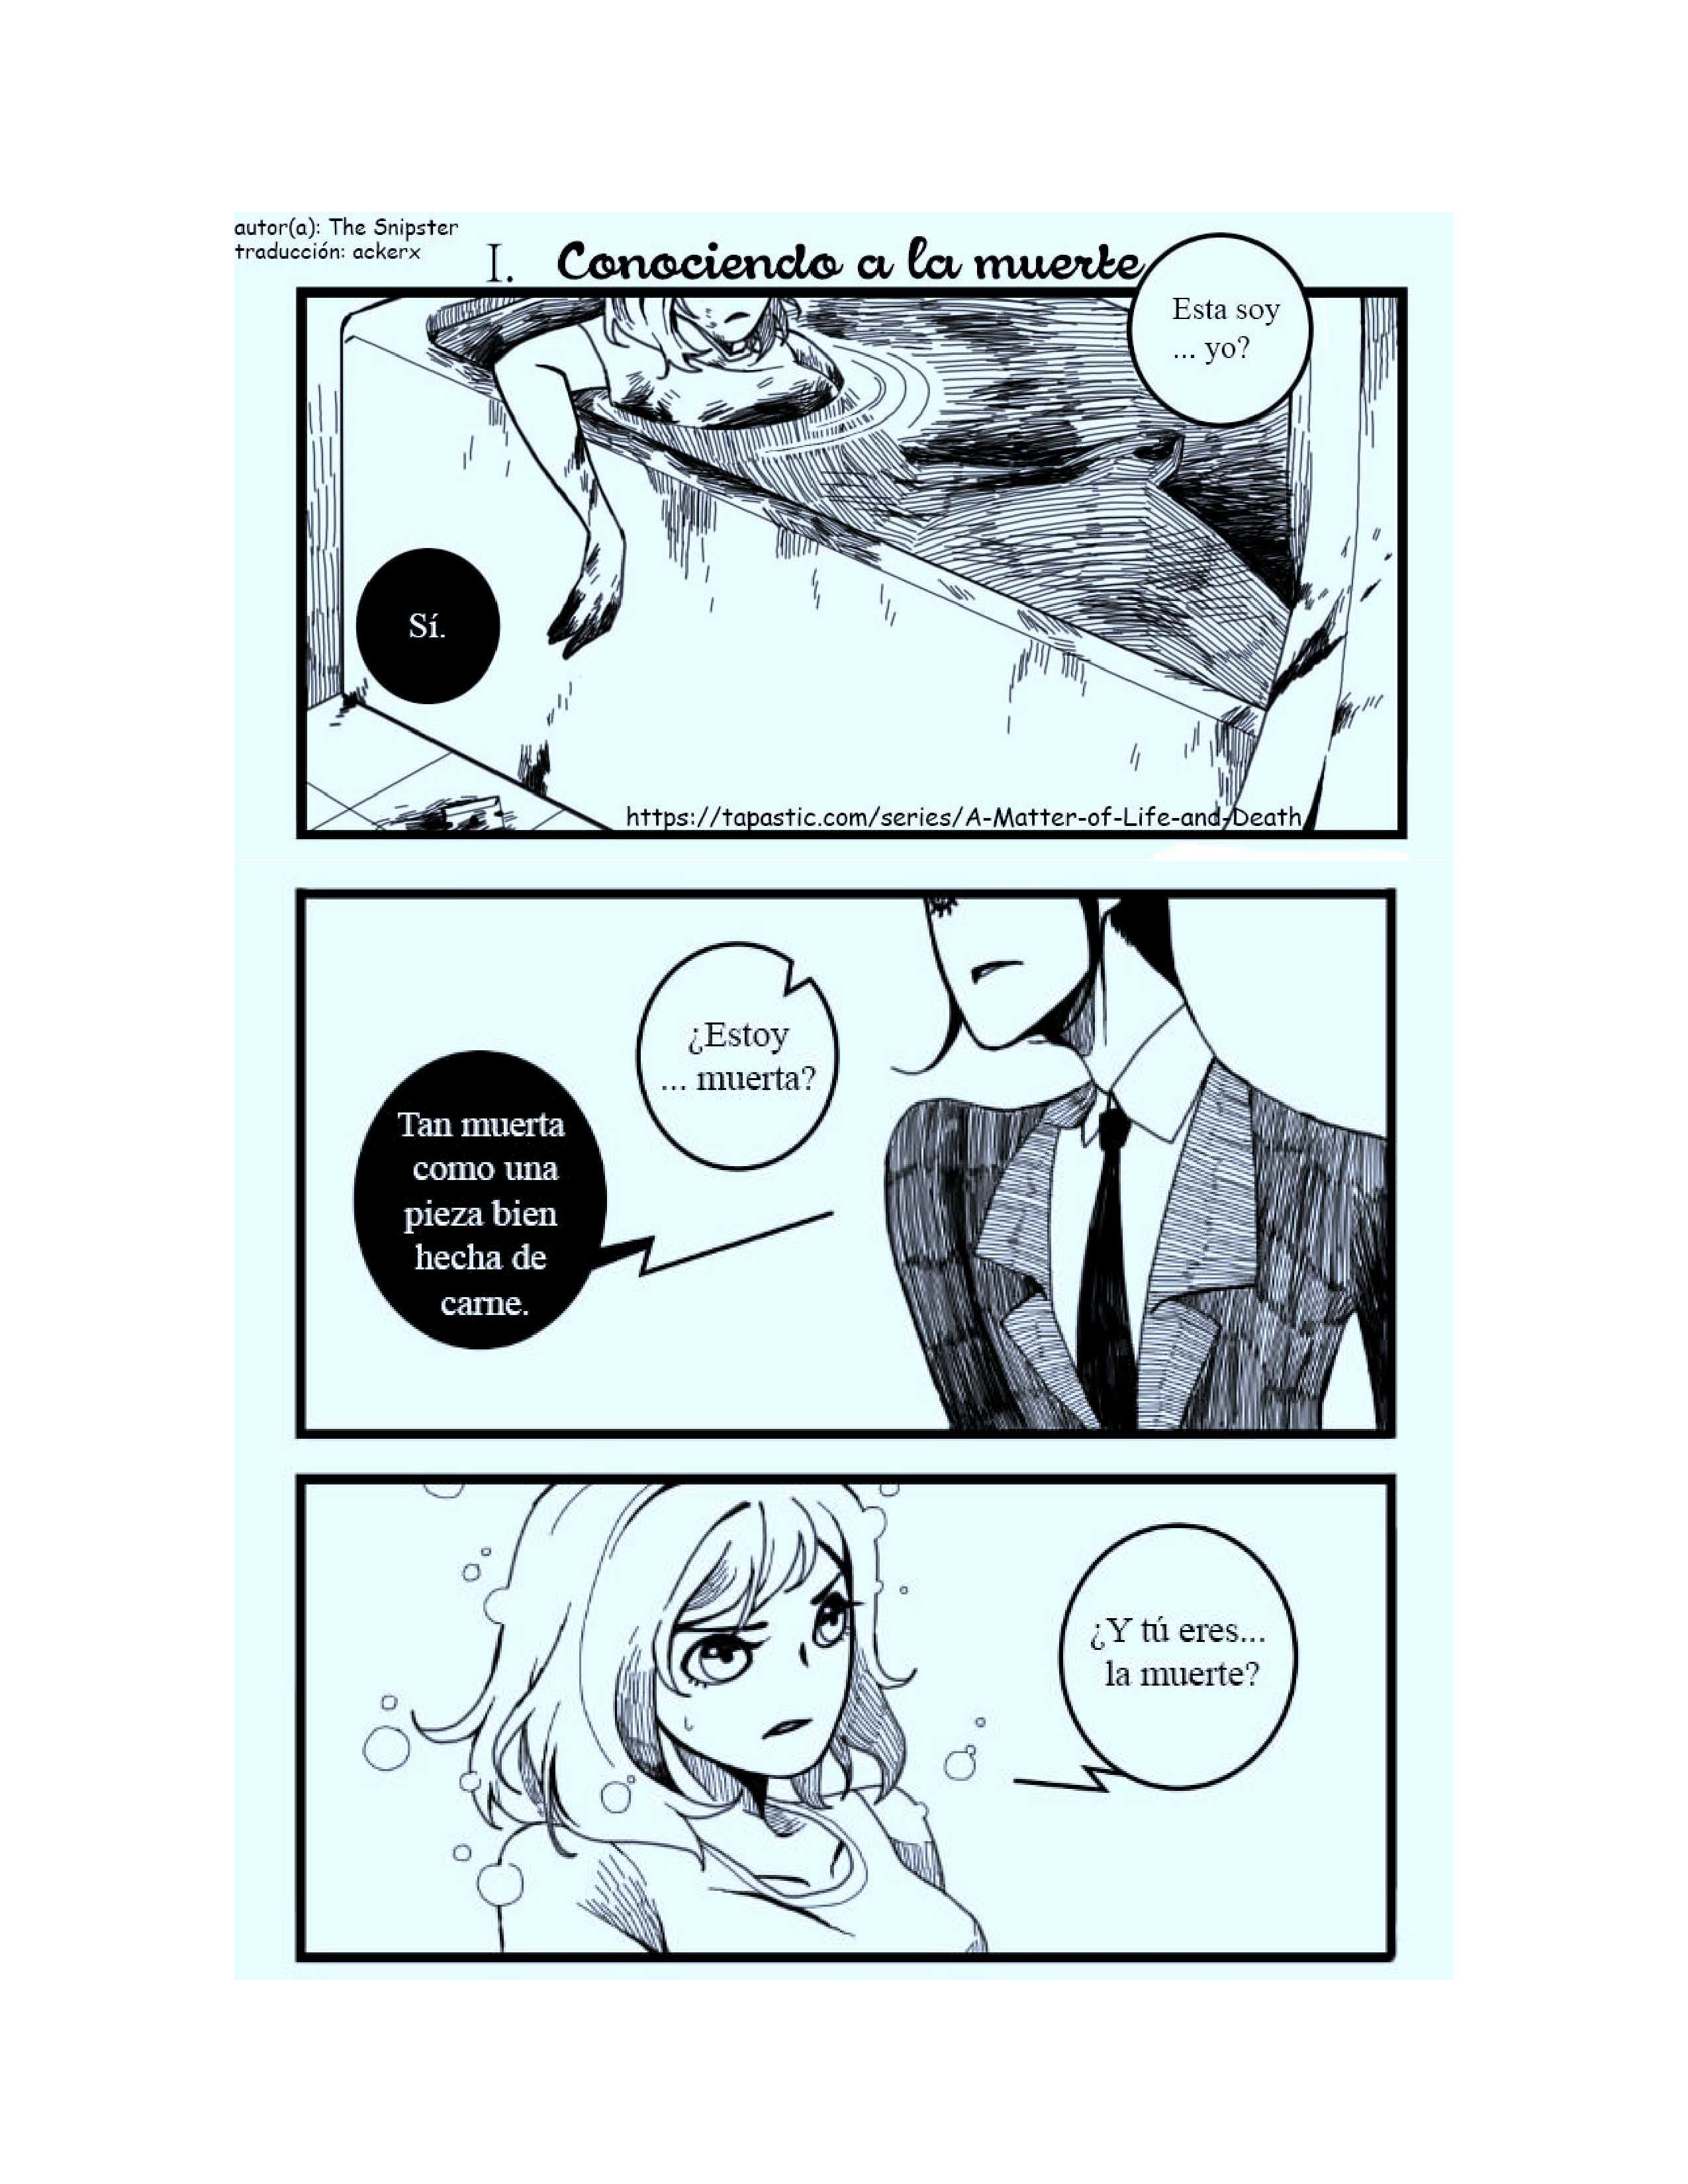 https://c5.mangatag.com/es_manga/pic2/62/20478/489593/8ffbcd62cdf41da17fd1d32fa3ba9a28.jpg Page 1